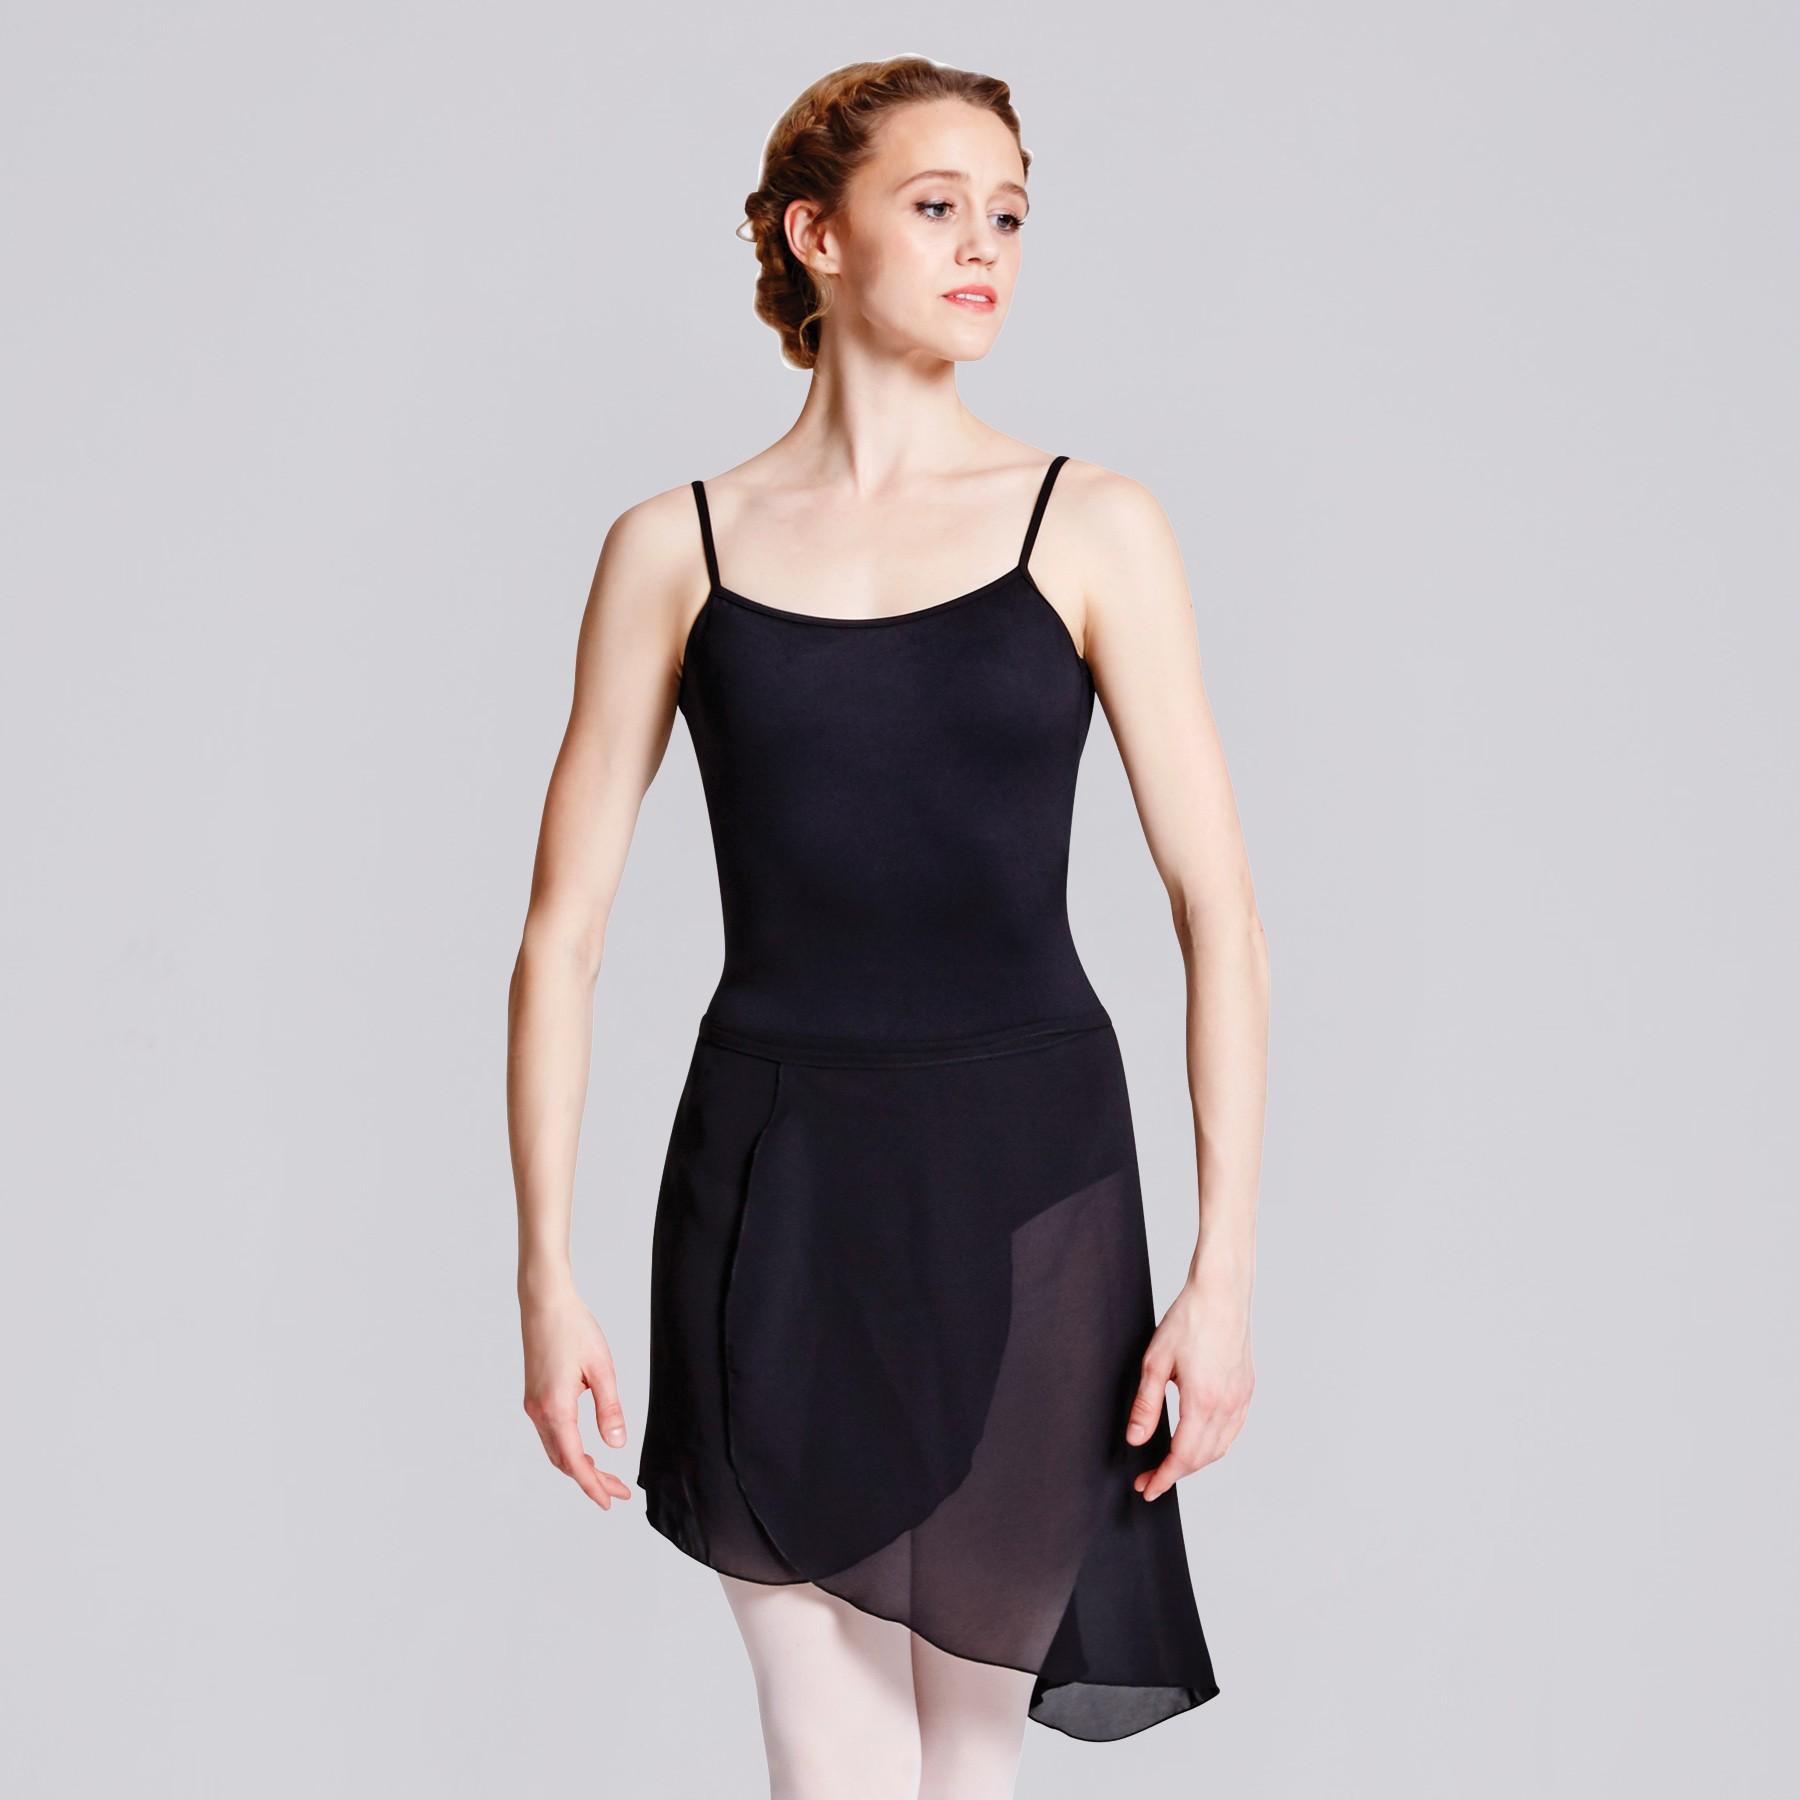 Bloch Maroney Georgette Asymmetrical Skirt Black Size Adult